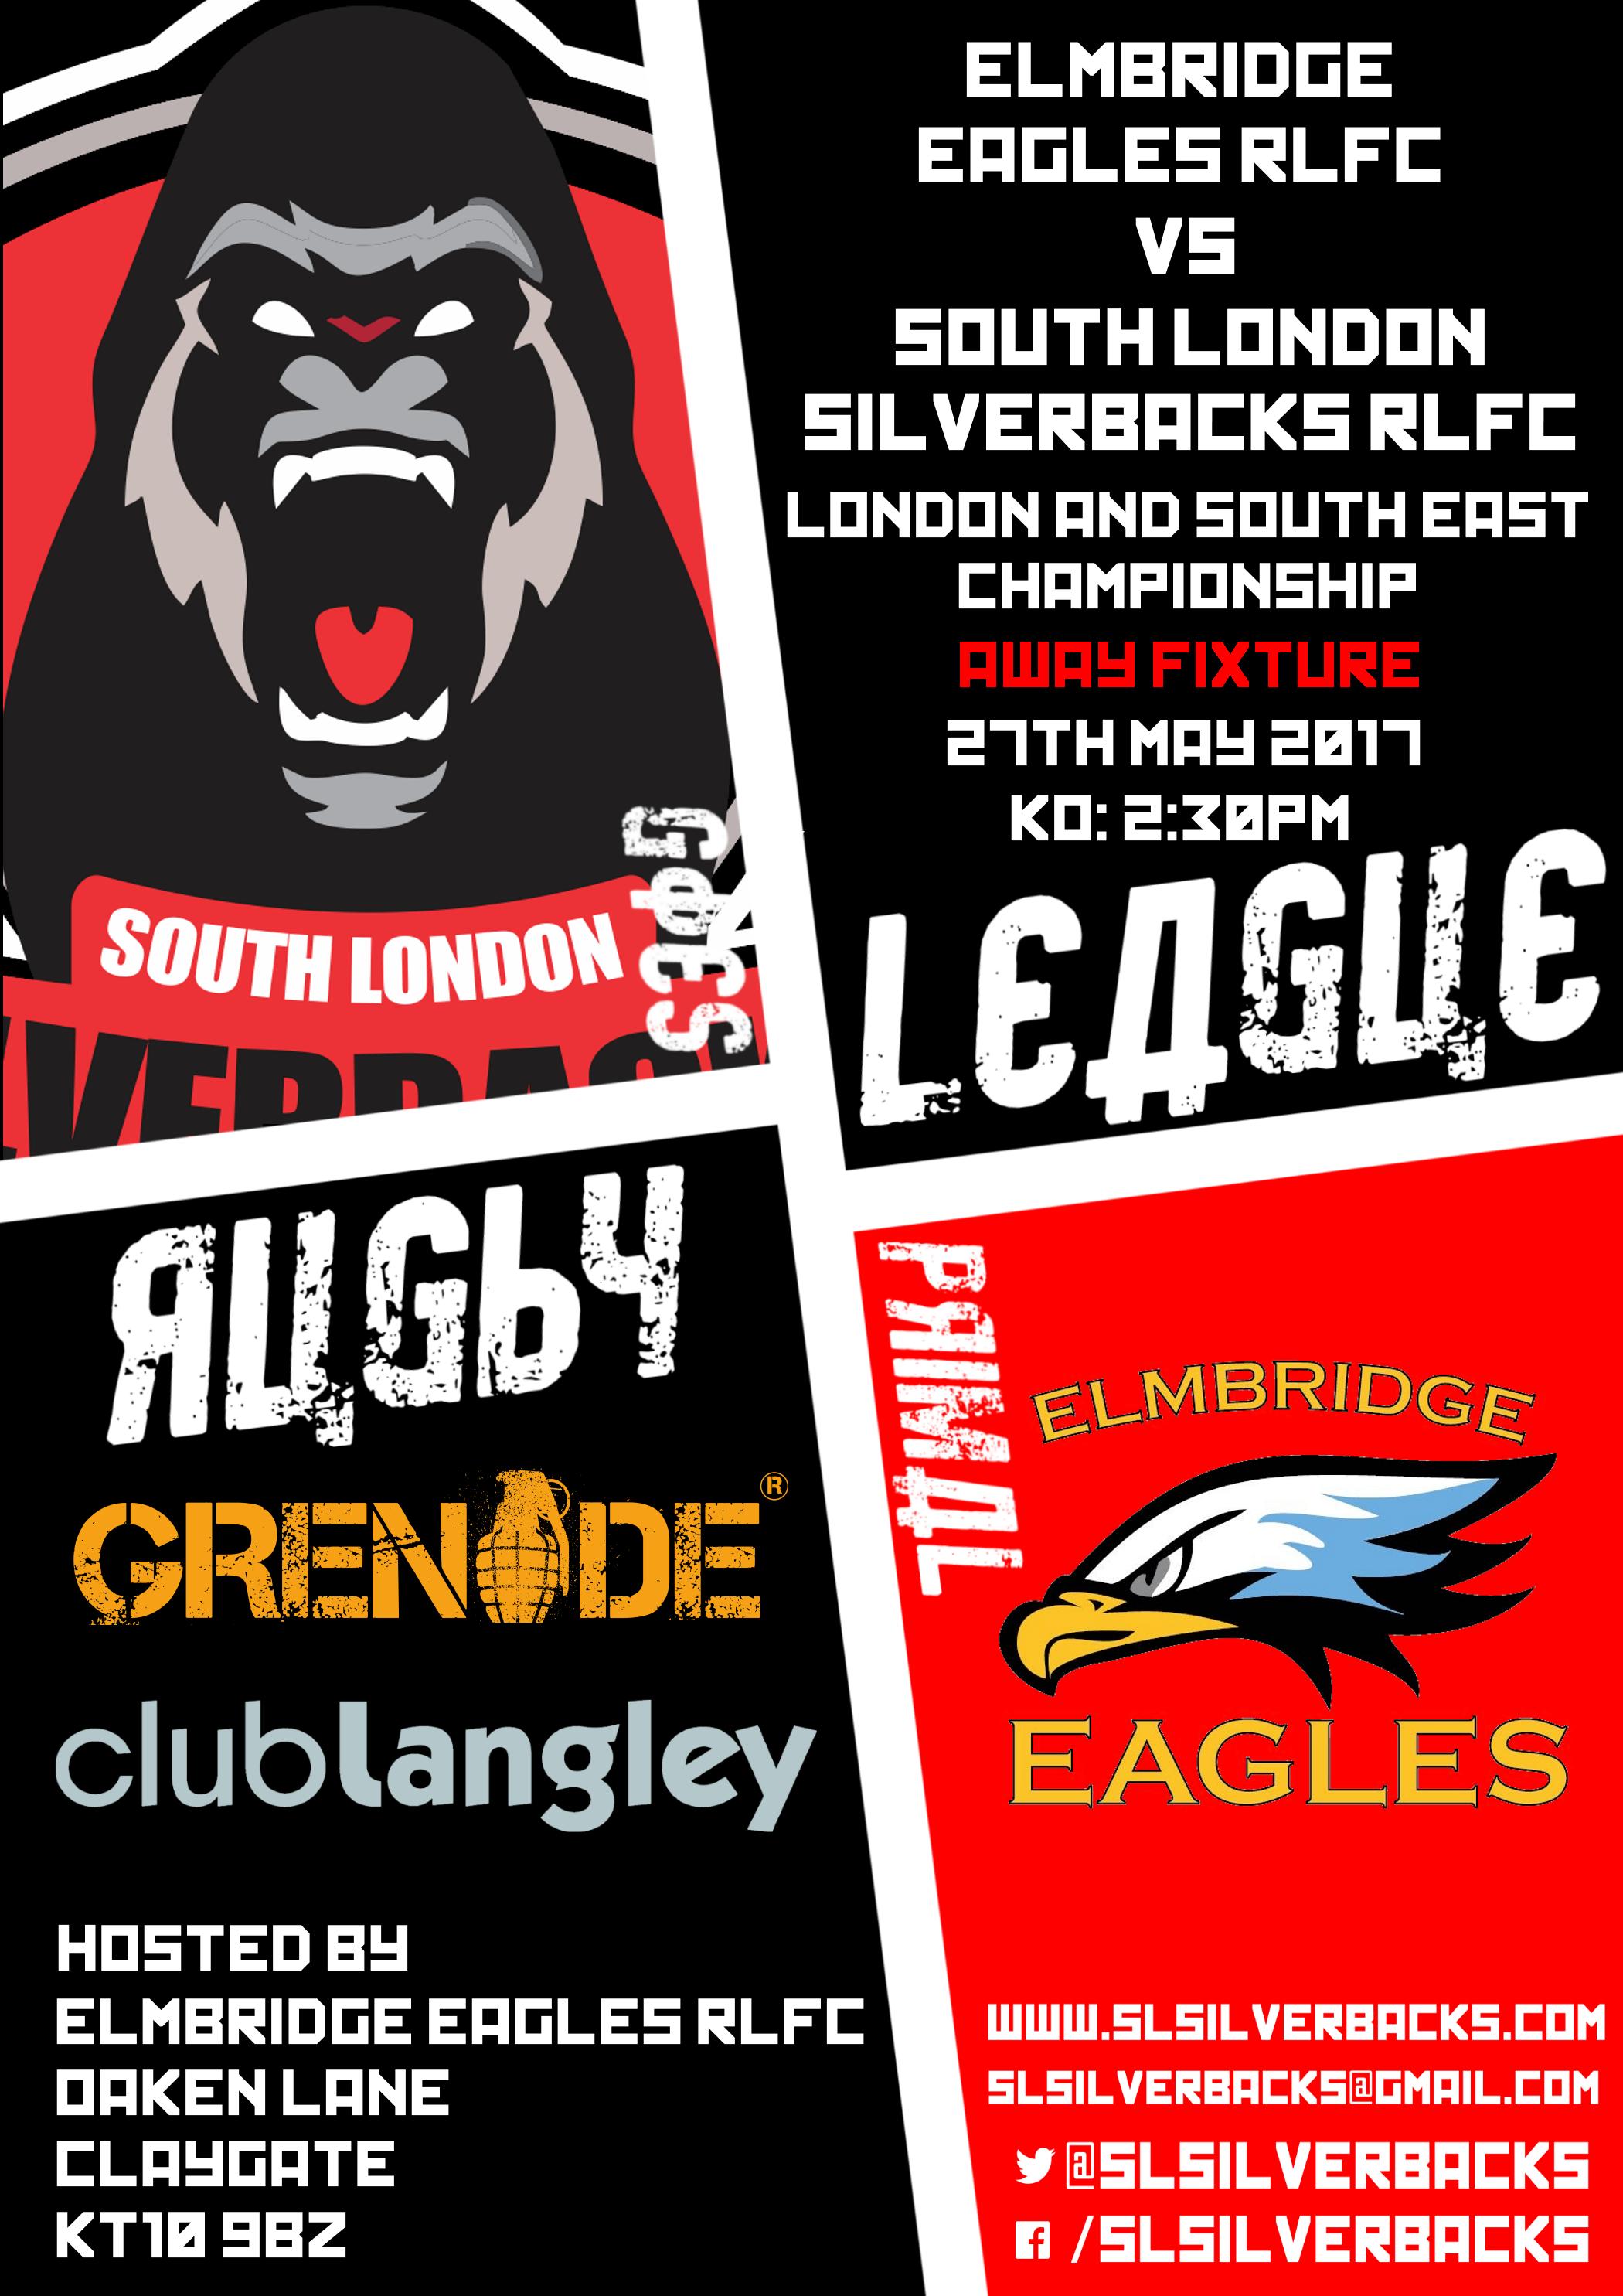 Elmbridge Eagles League Away